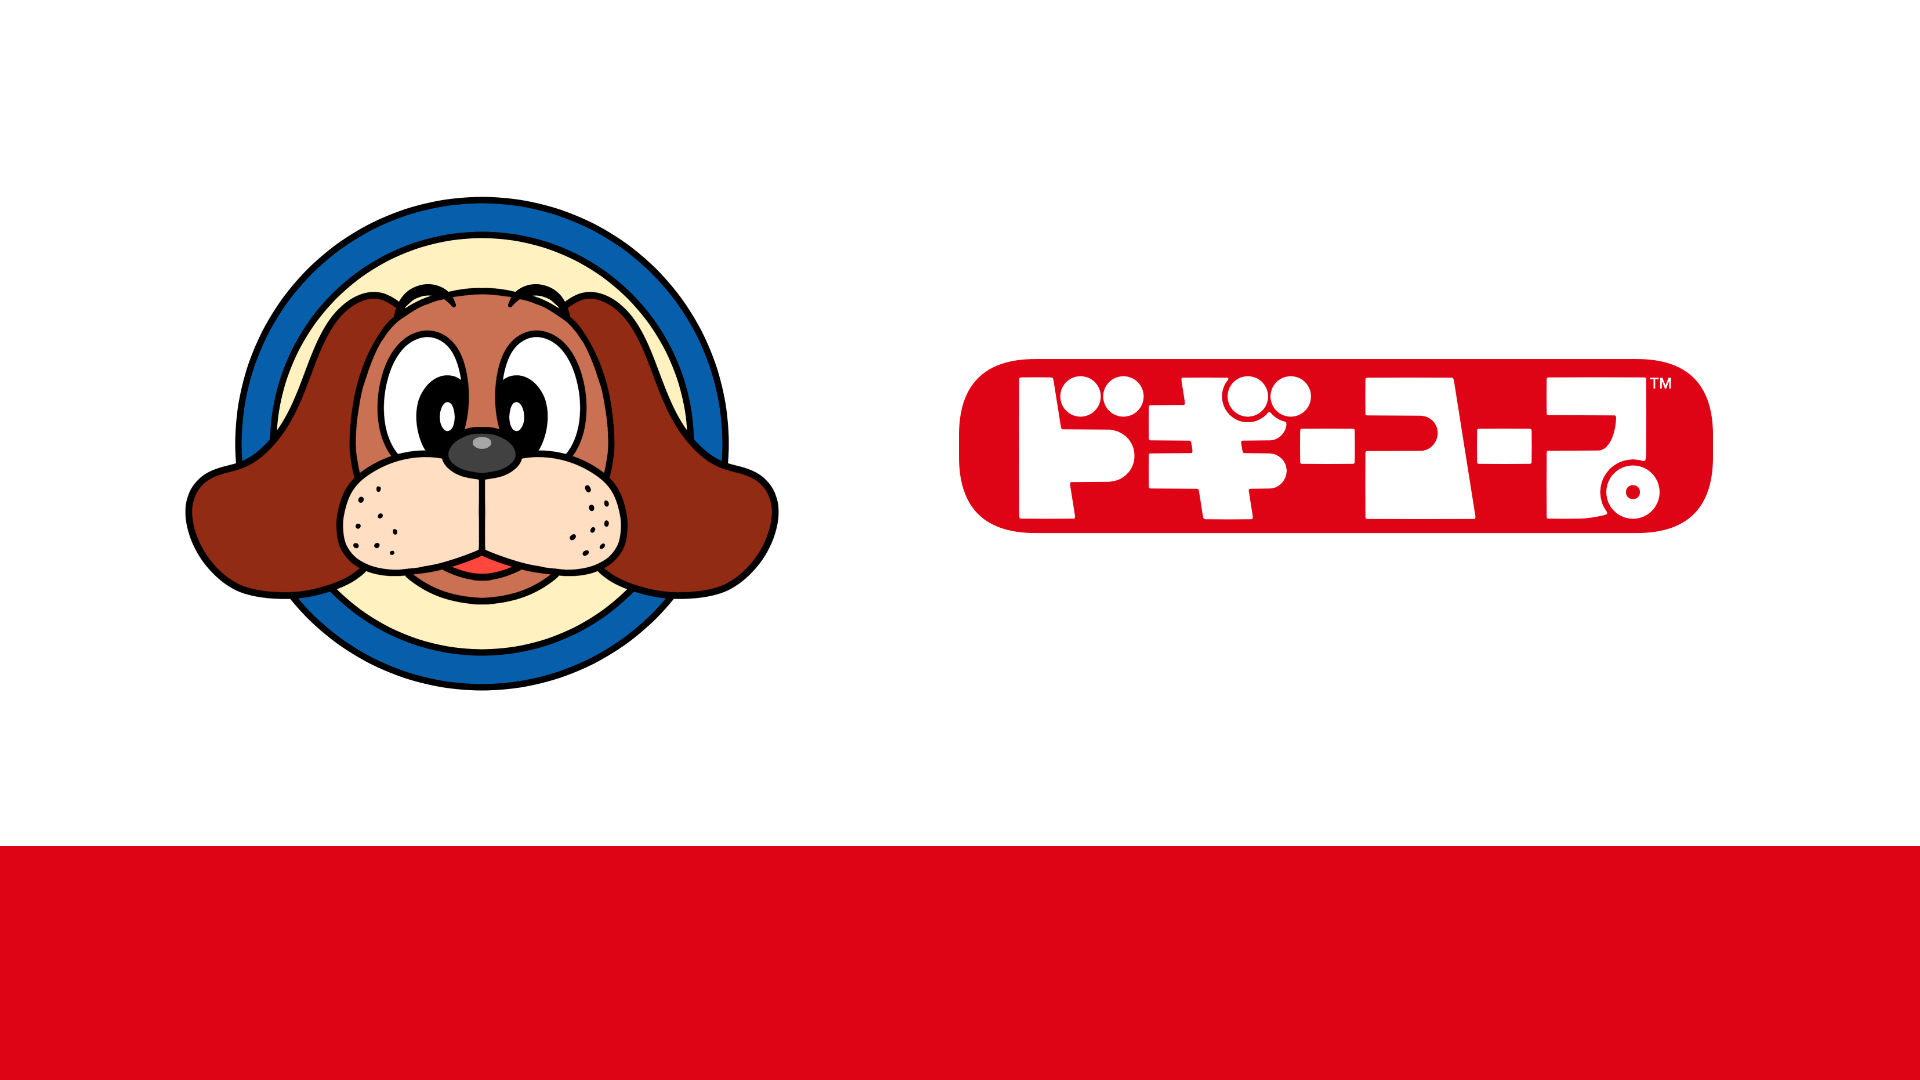 logo-doggy.jpg